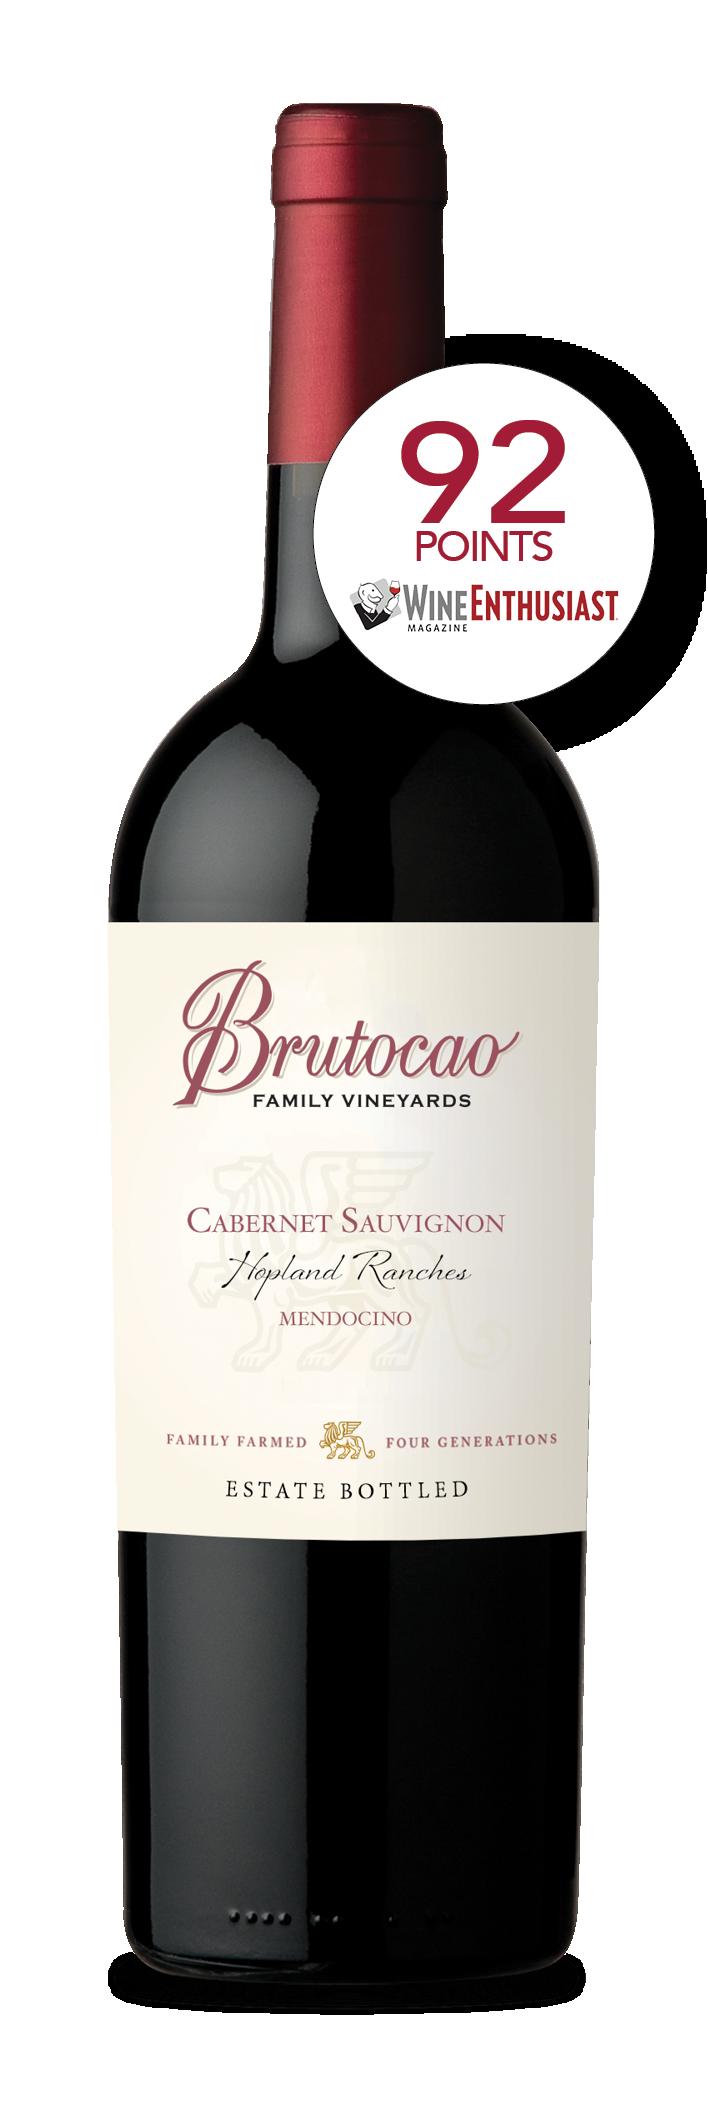 2017 Cabernet Sauvignon, Hopland Ranches, Estate Bottled (750mL)